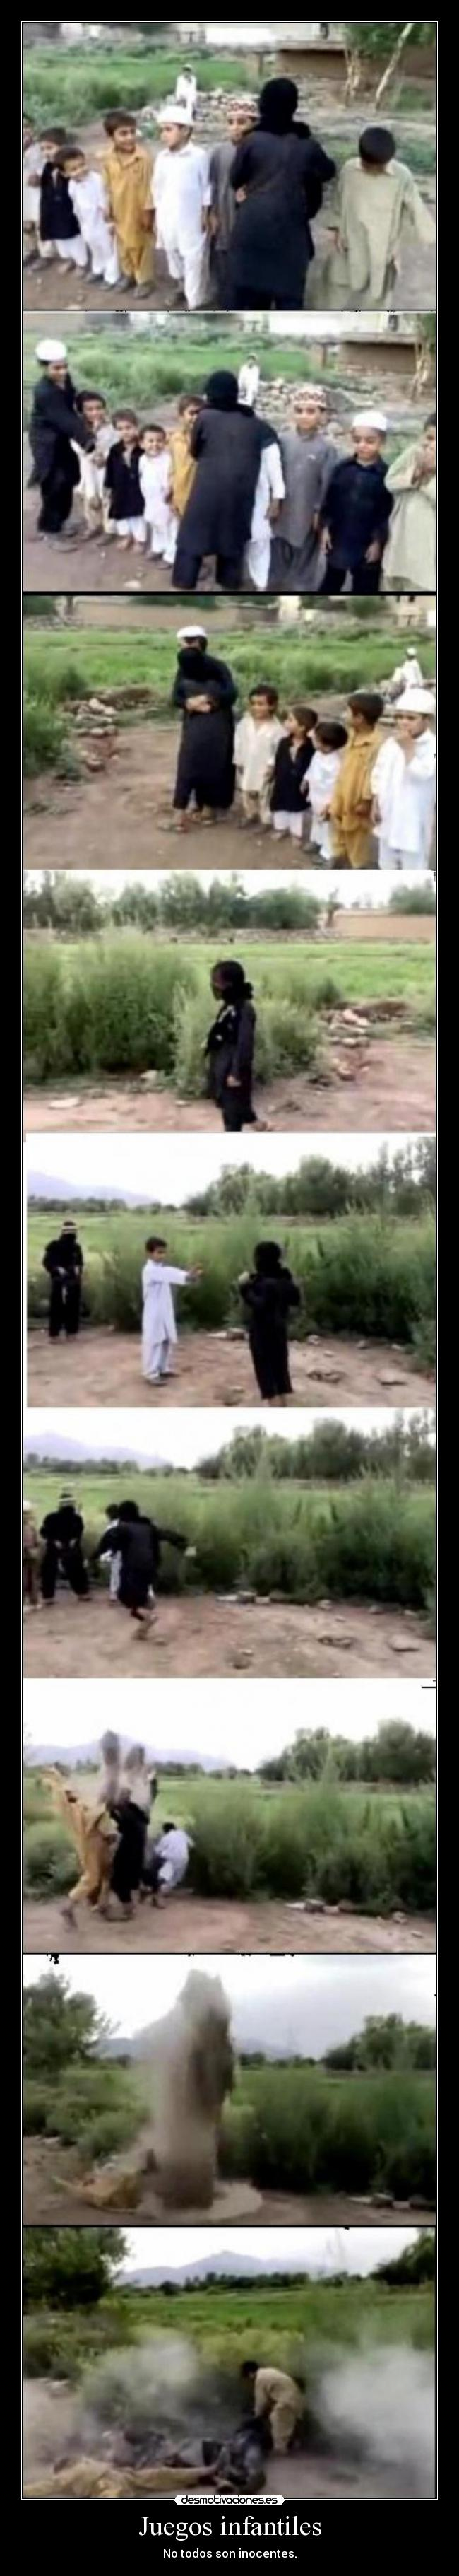 carteles juegos infantiles inocentes zorra implakable pakistan bomba desmotivaciones